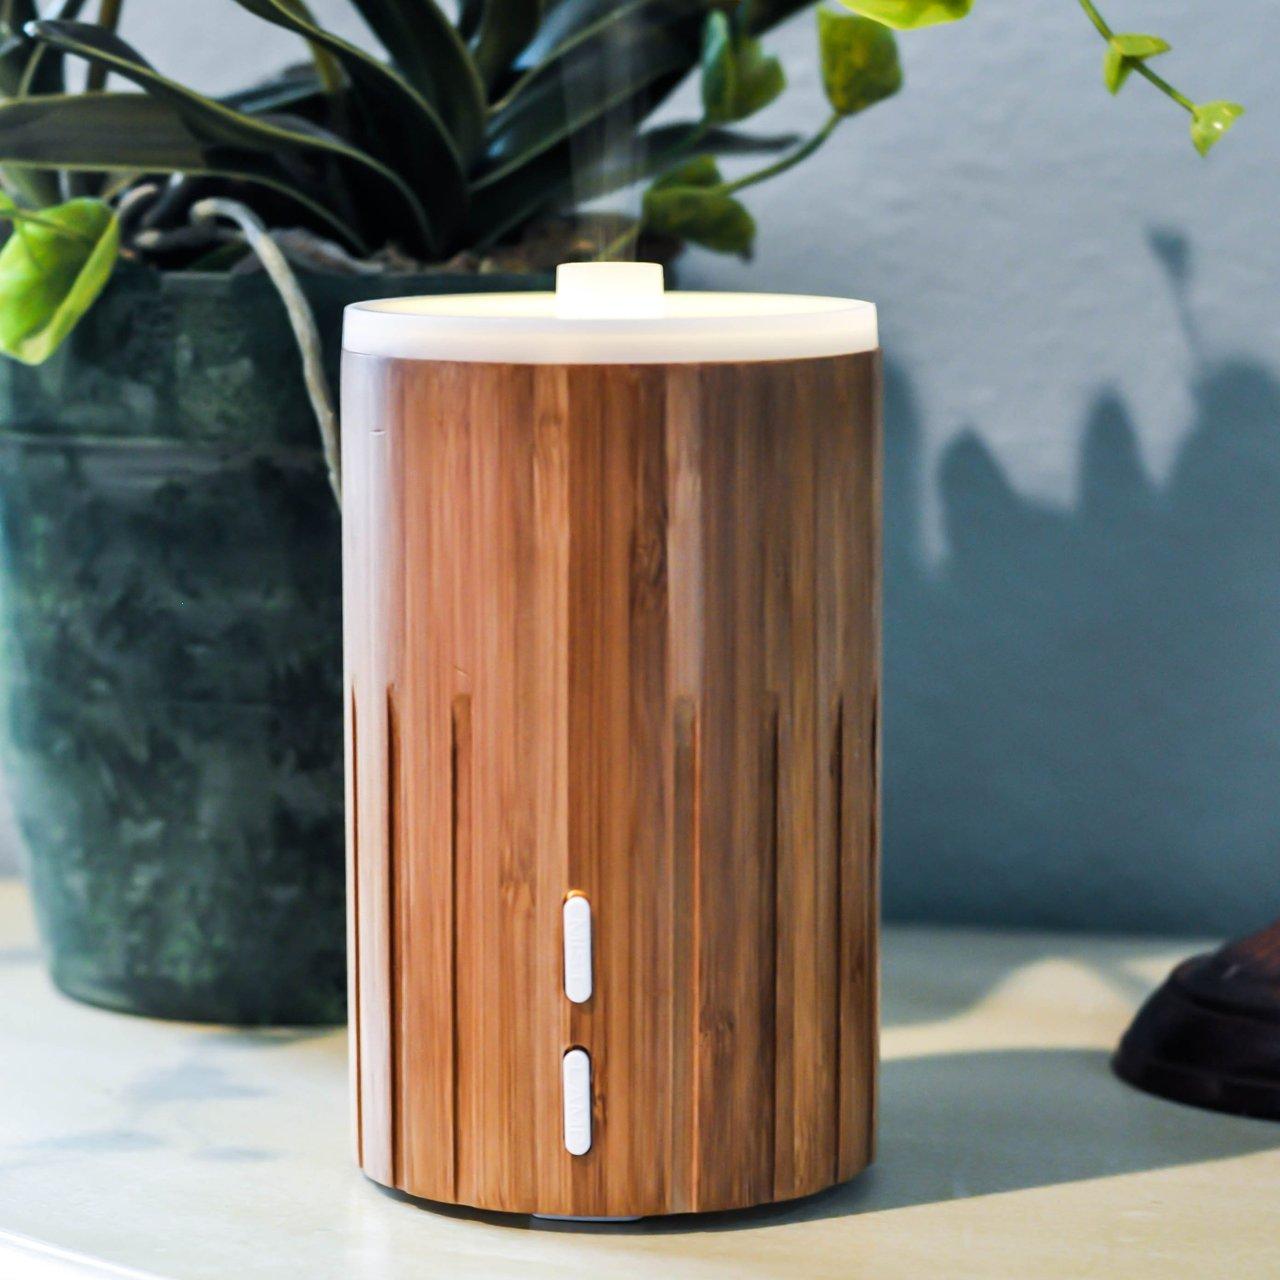 Bamboo Aroma Diffuser